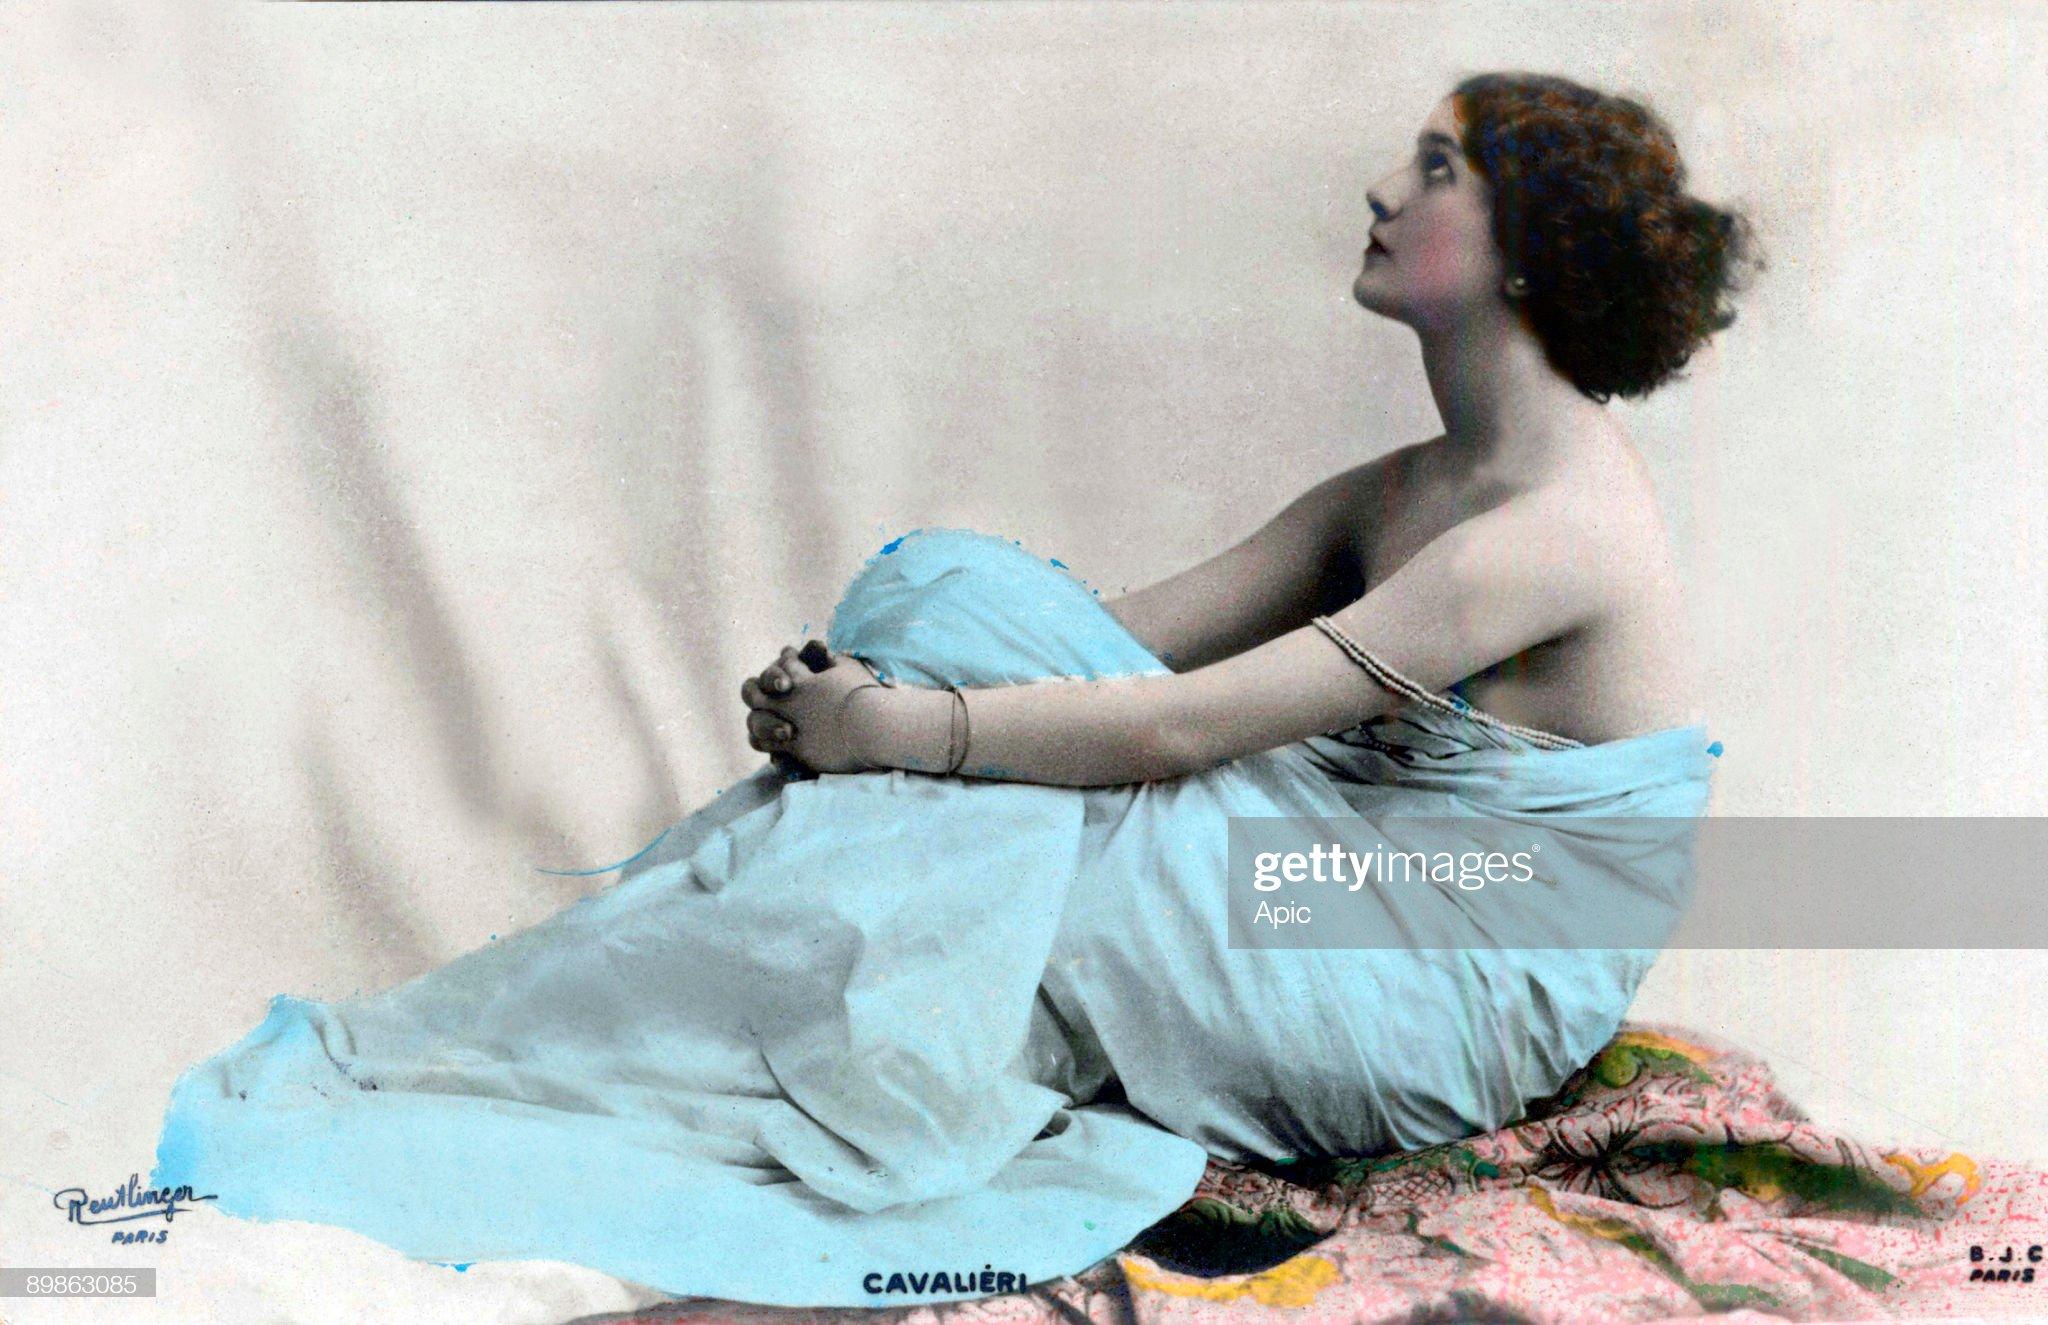 opera singer Lina Cavalieri (1874-1944), postacrd, photographed by Reutlinger, c. 1900-1905 : News Photo